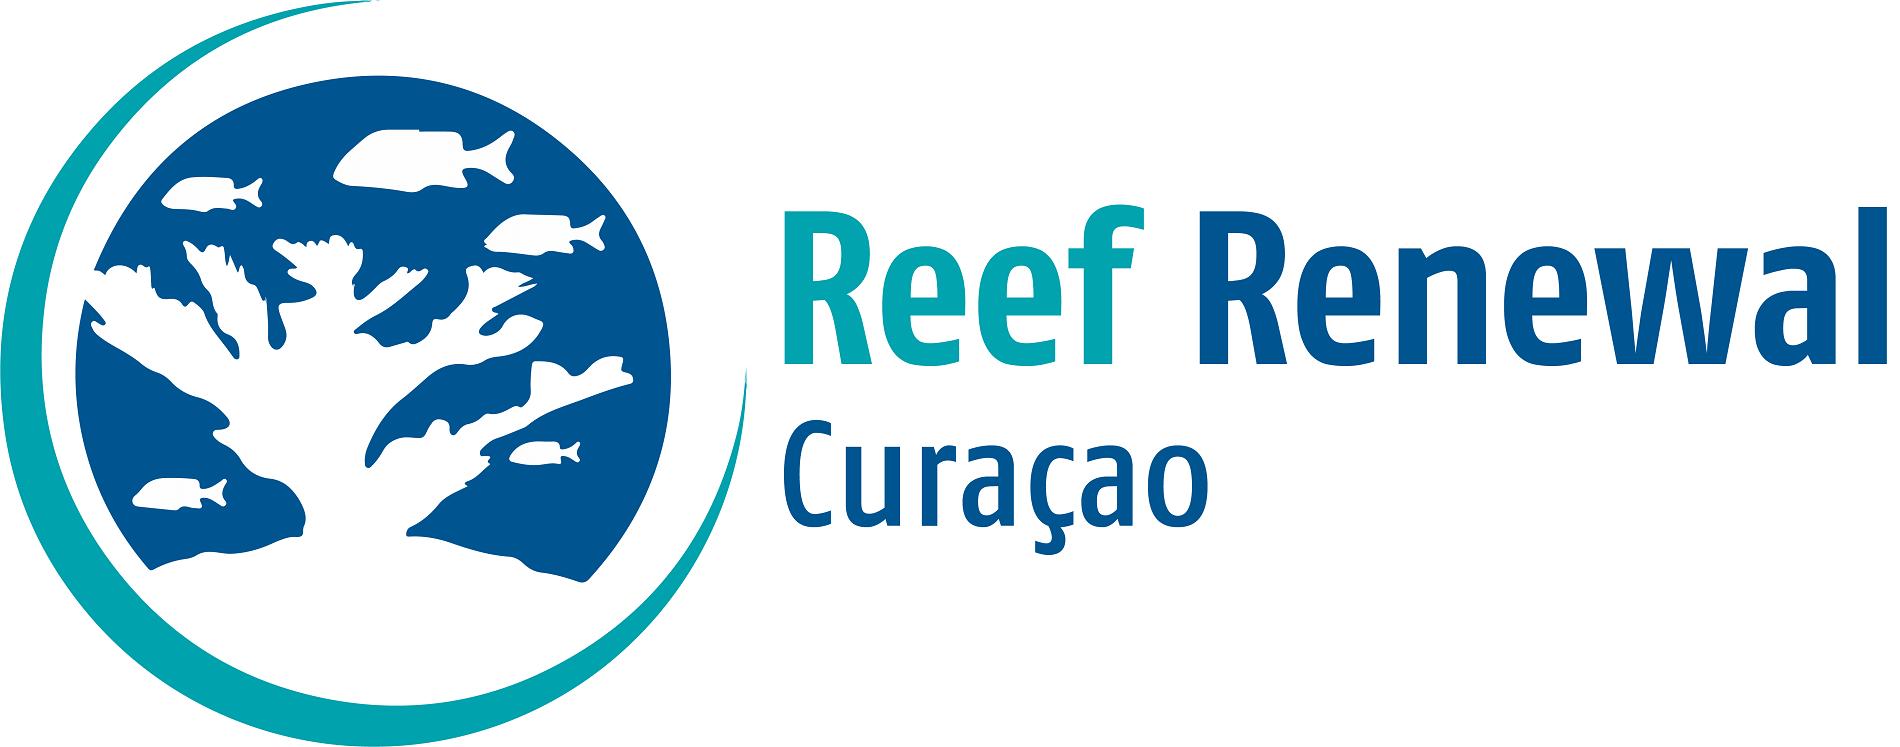 Reef Renewal Curacao   Dive Curacao